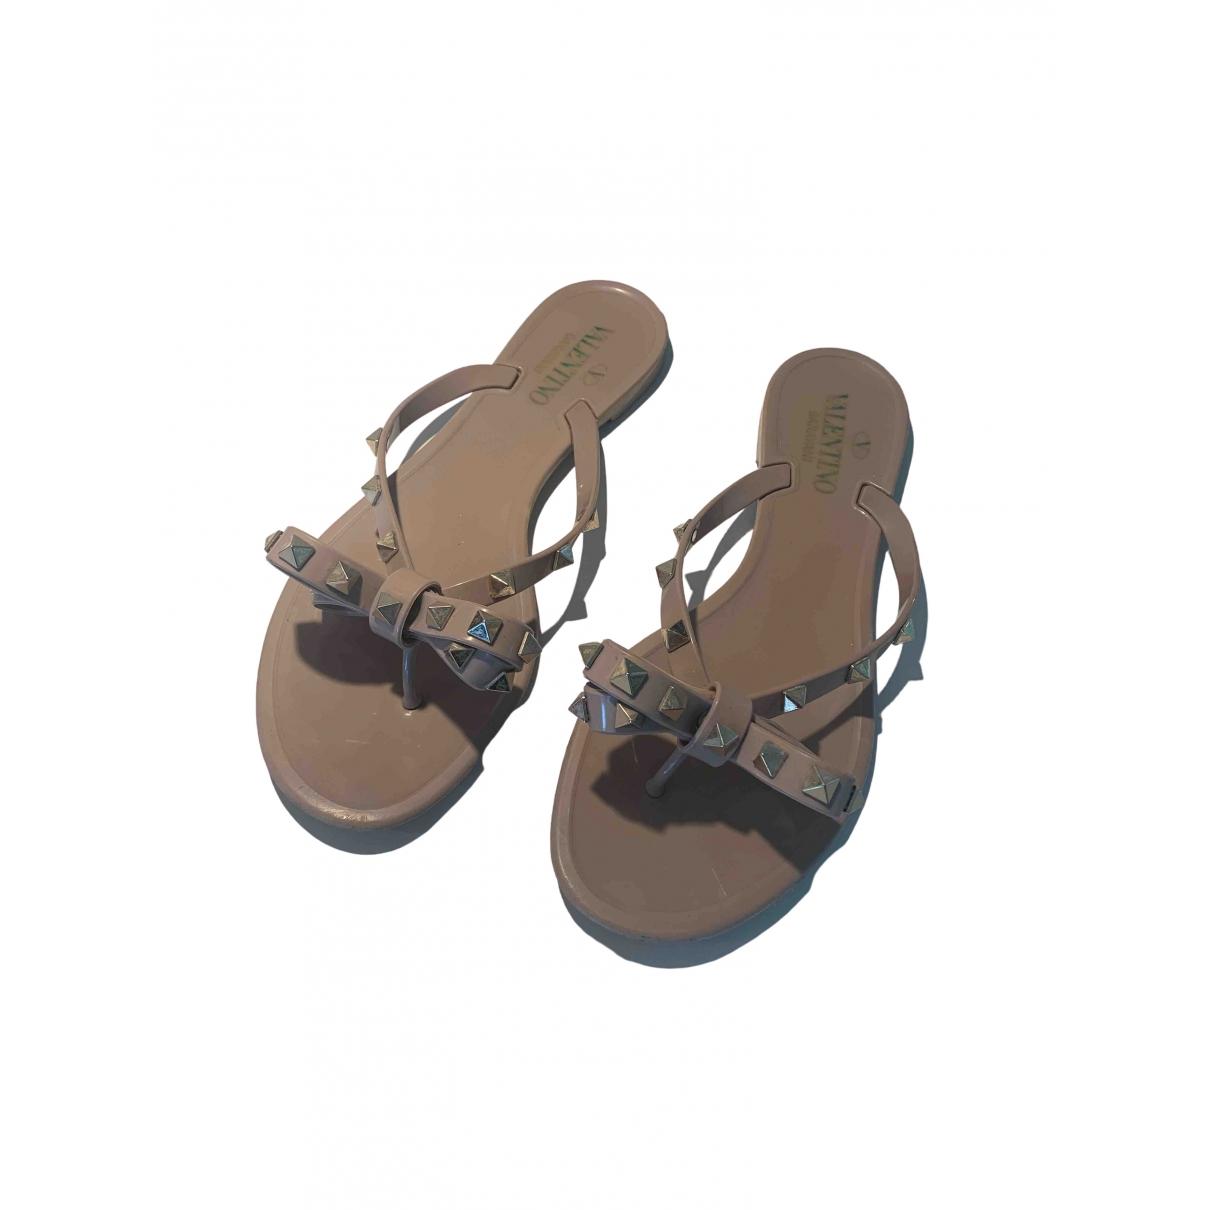 Valentino Garavani Rockstud Beige Rubber Sandals for Women 38 EU